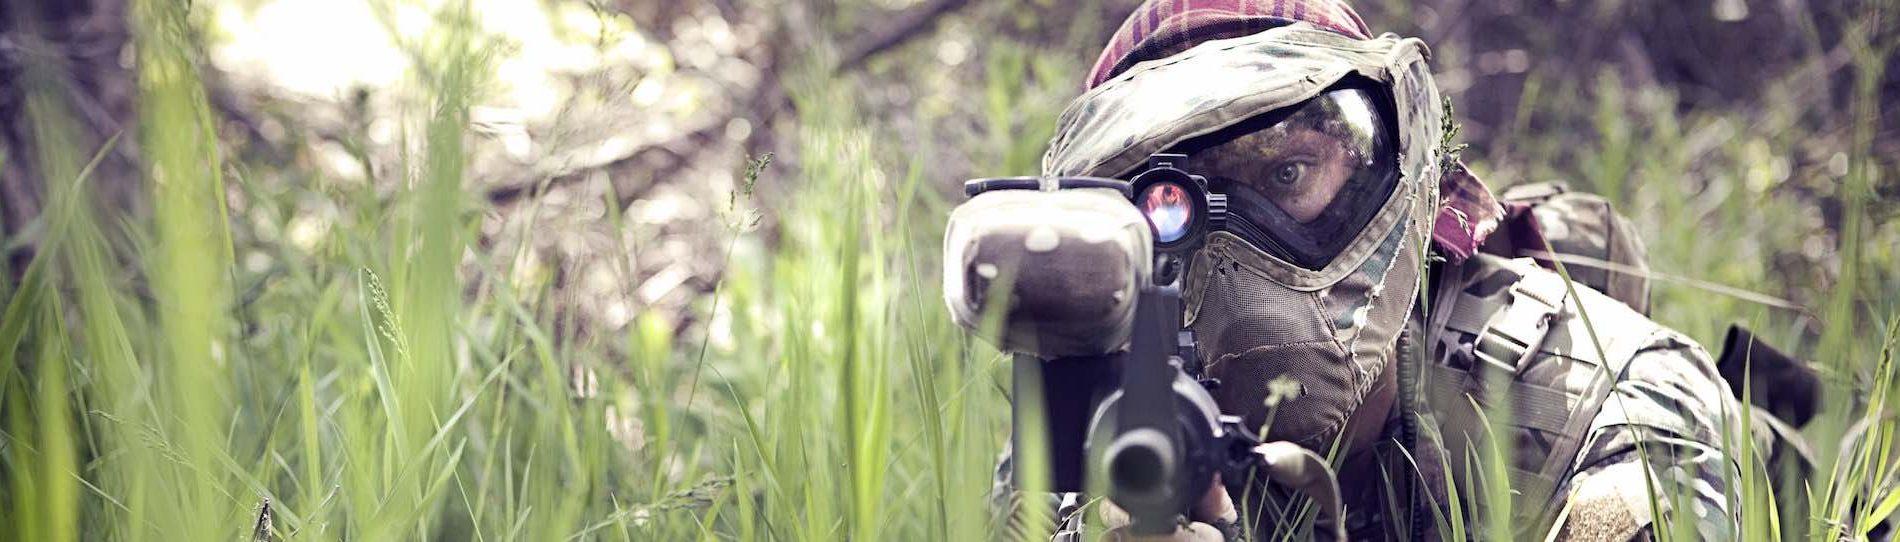 buck shooting paintball gun